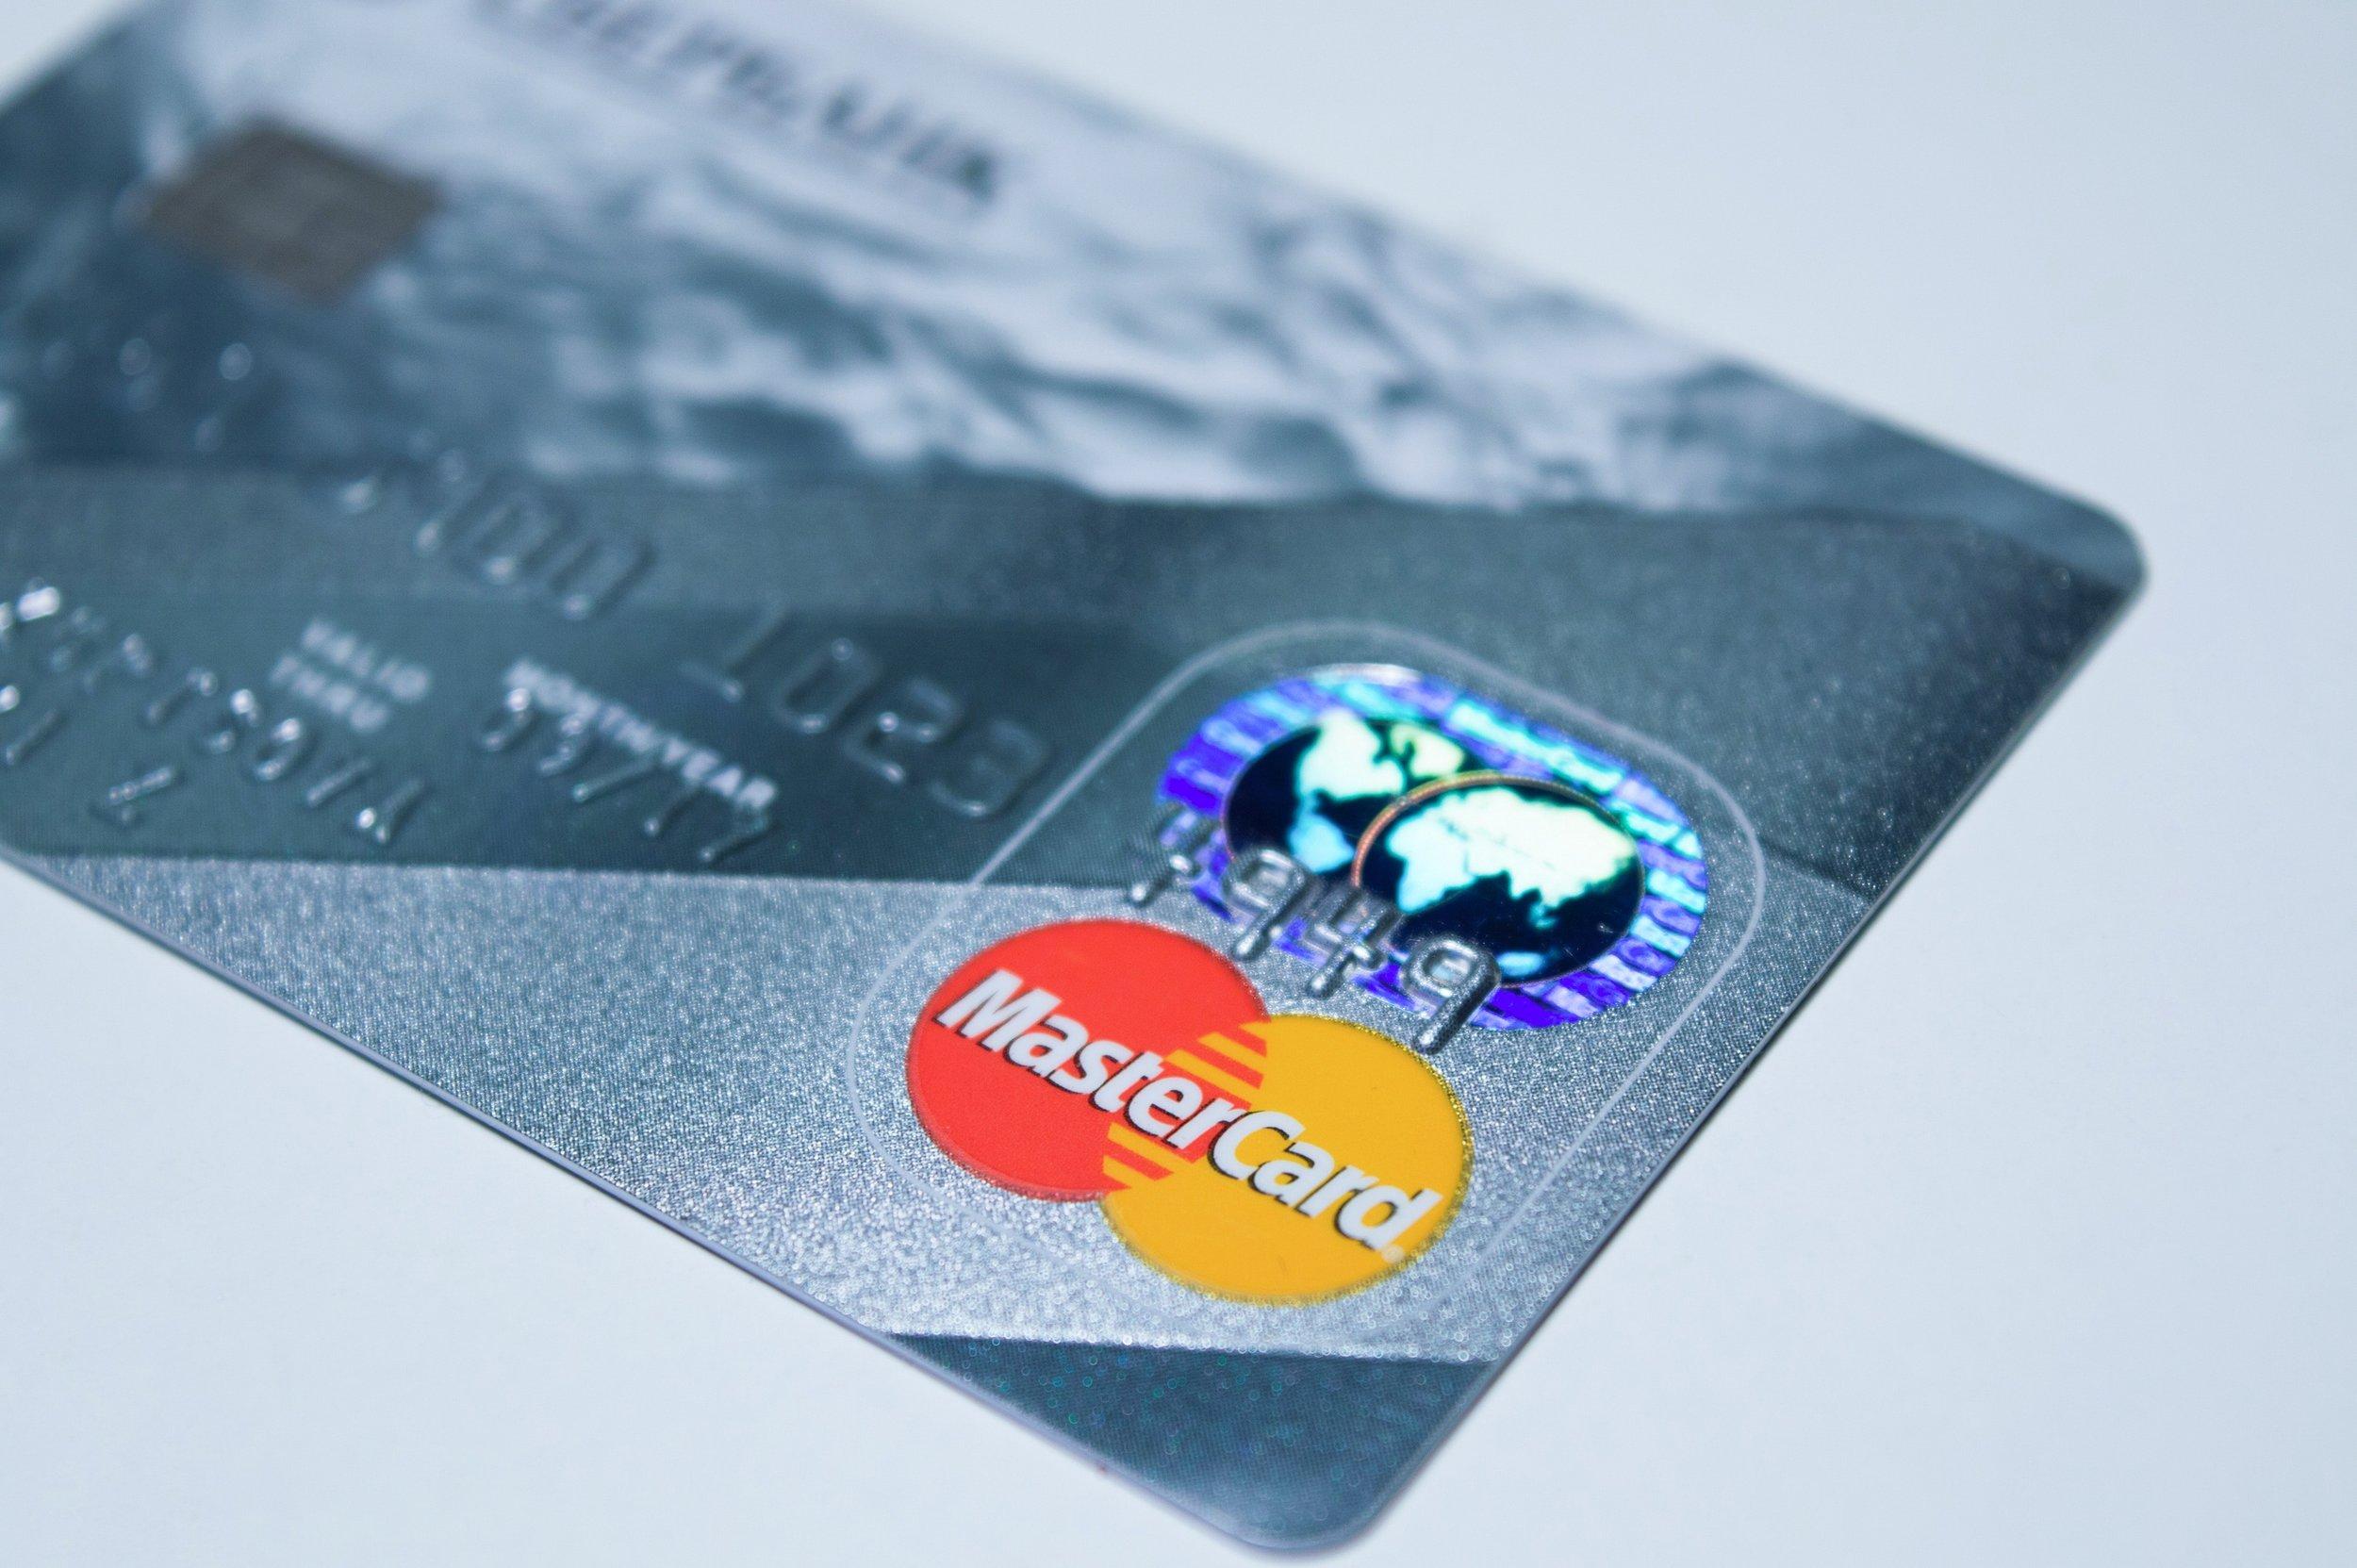 card-credit-card-mastercard-210742.jpg